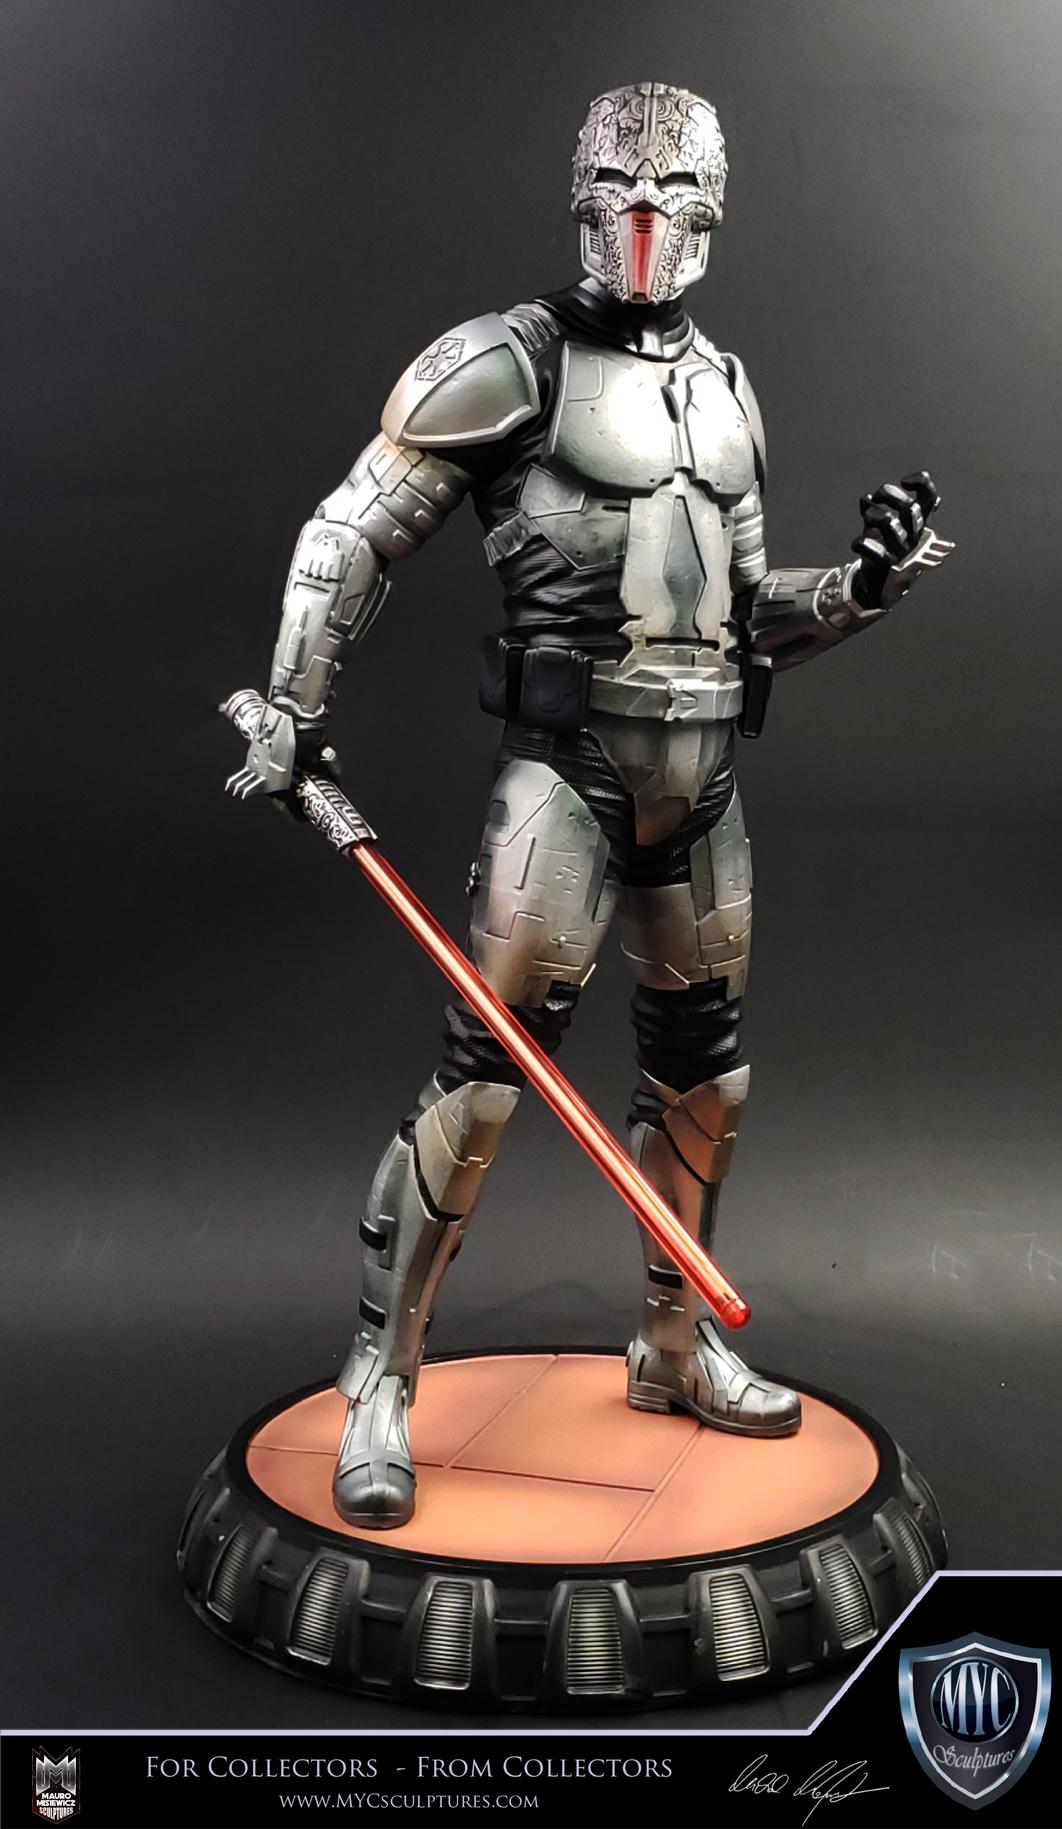 Sith_Acolyte_MYC_Sculptures_Statue_21